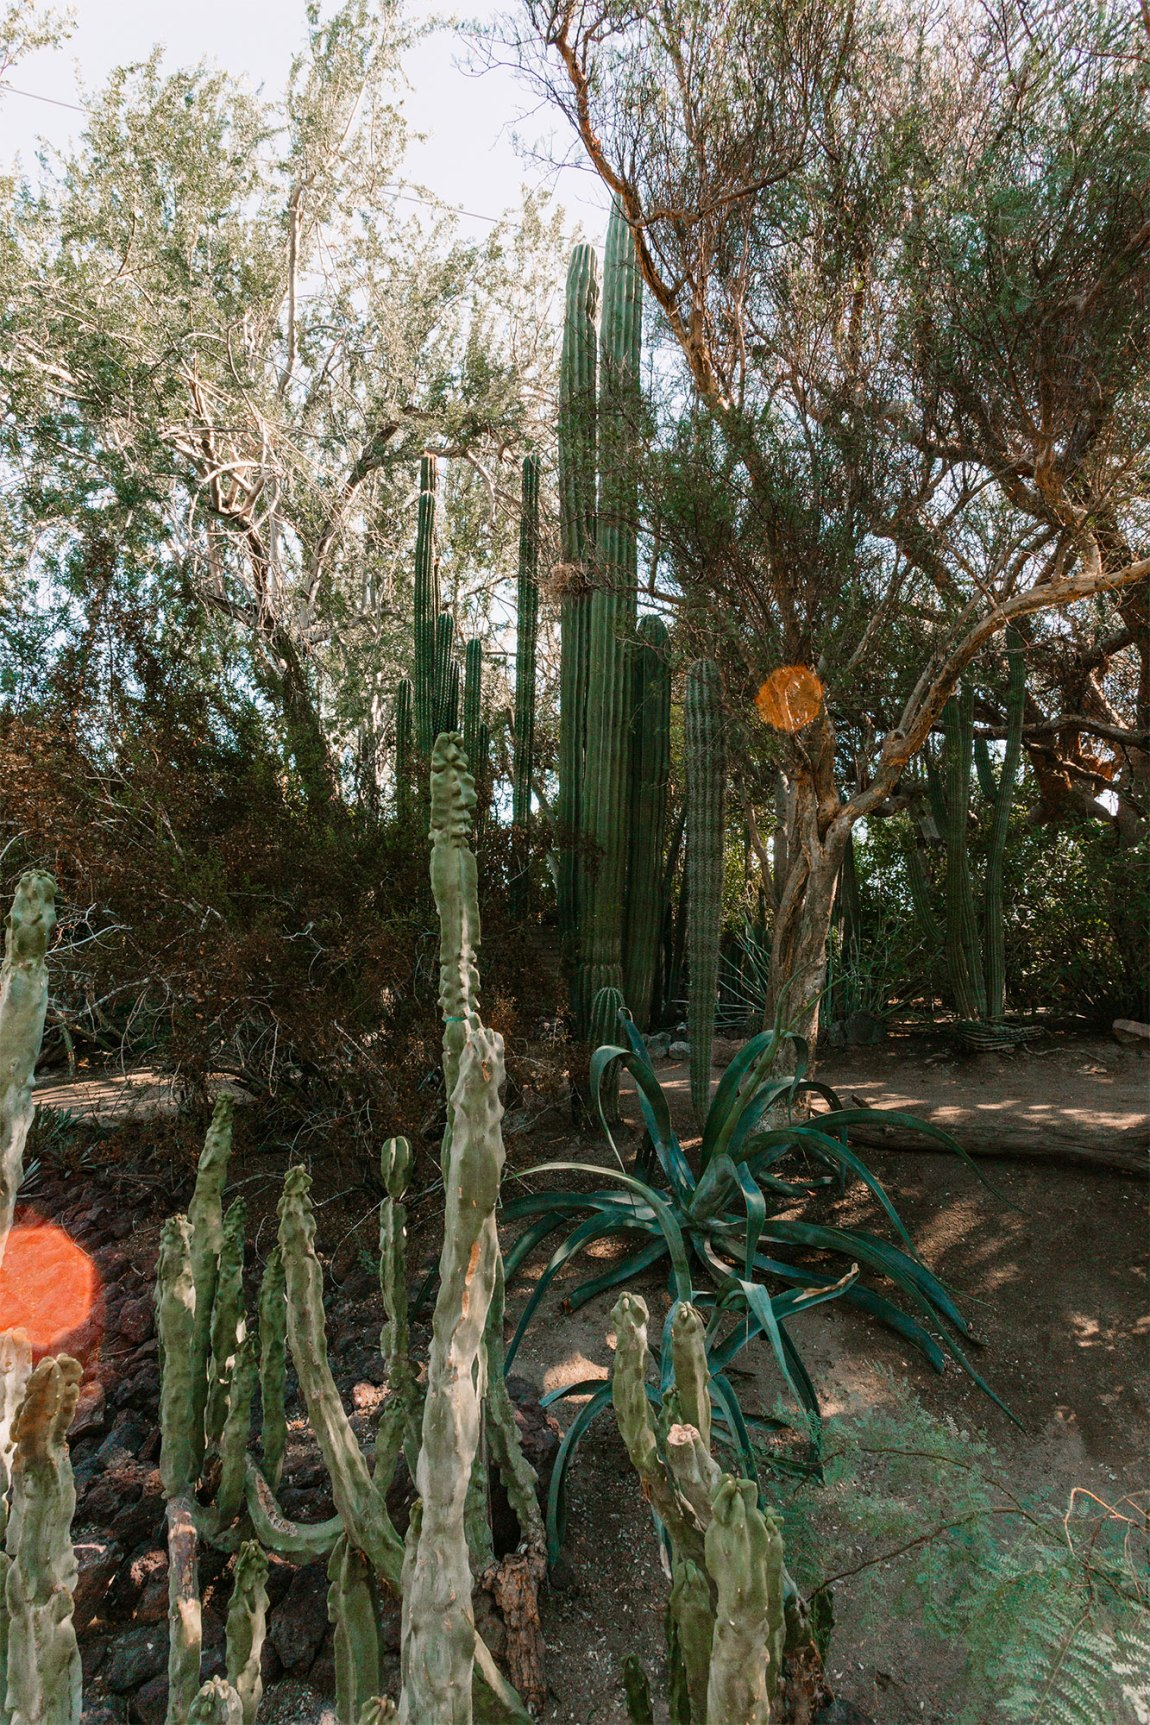 Tall cactus garden in the desert landscape